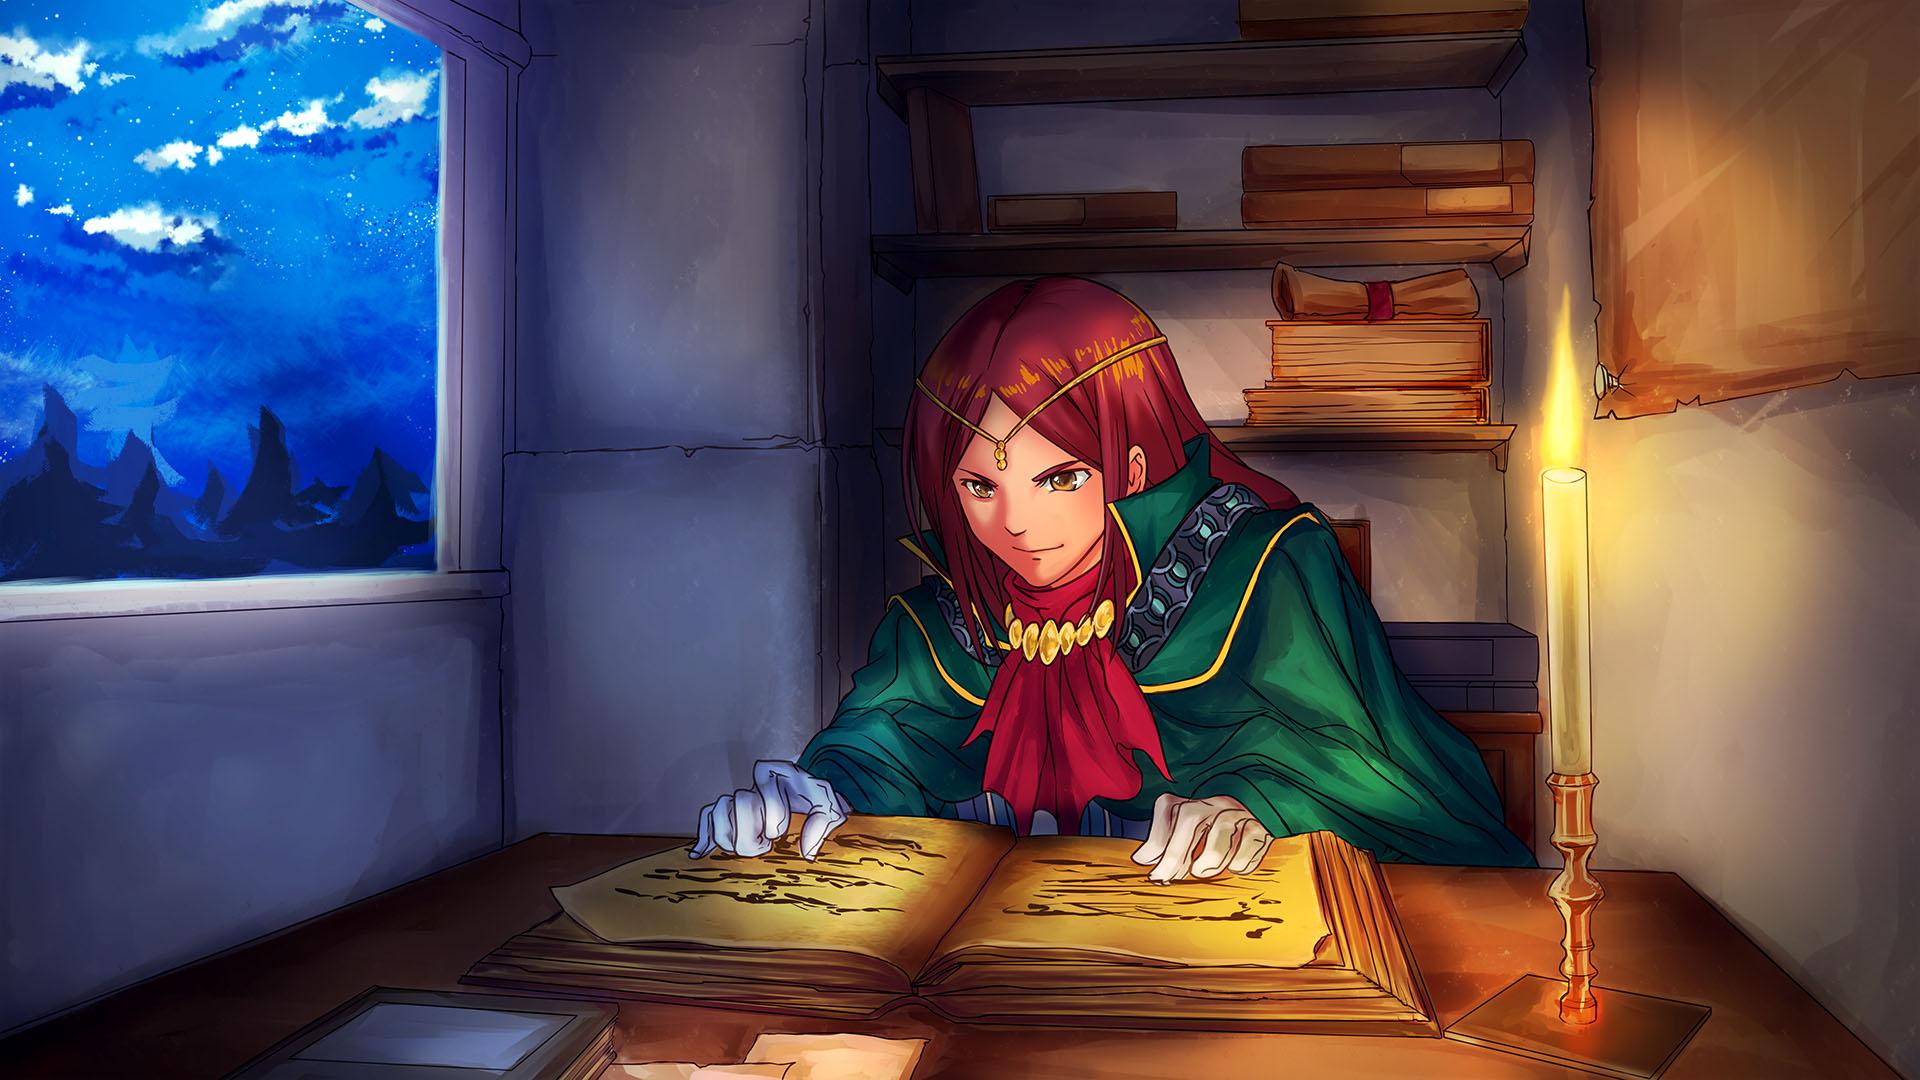 RPG Maker VX Ace - The Star Seeker | Steam Trading Cards